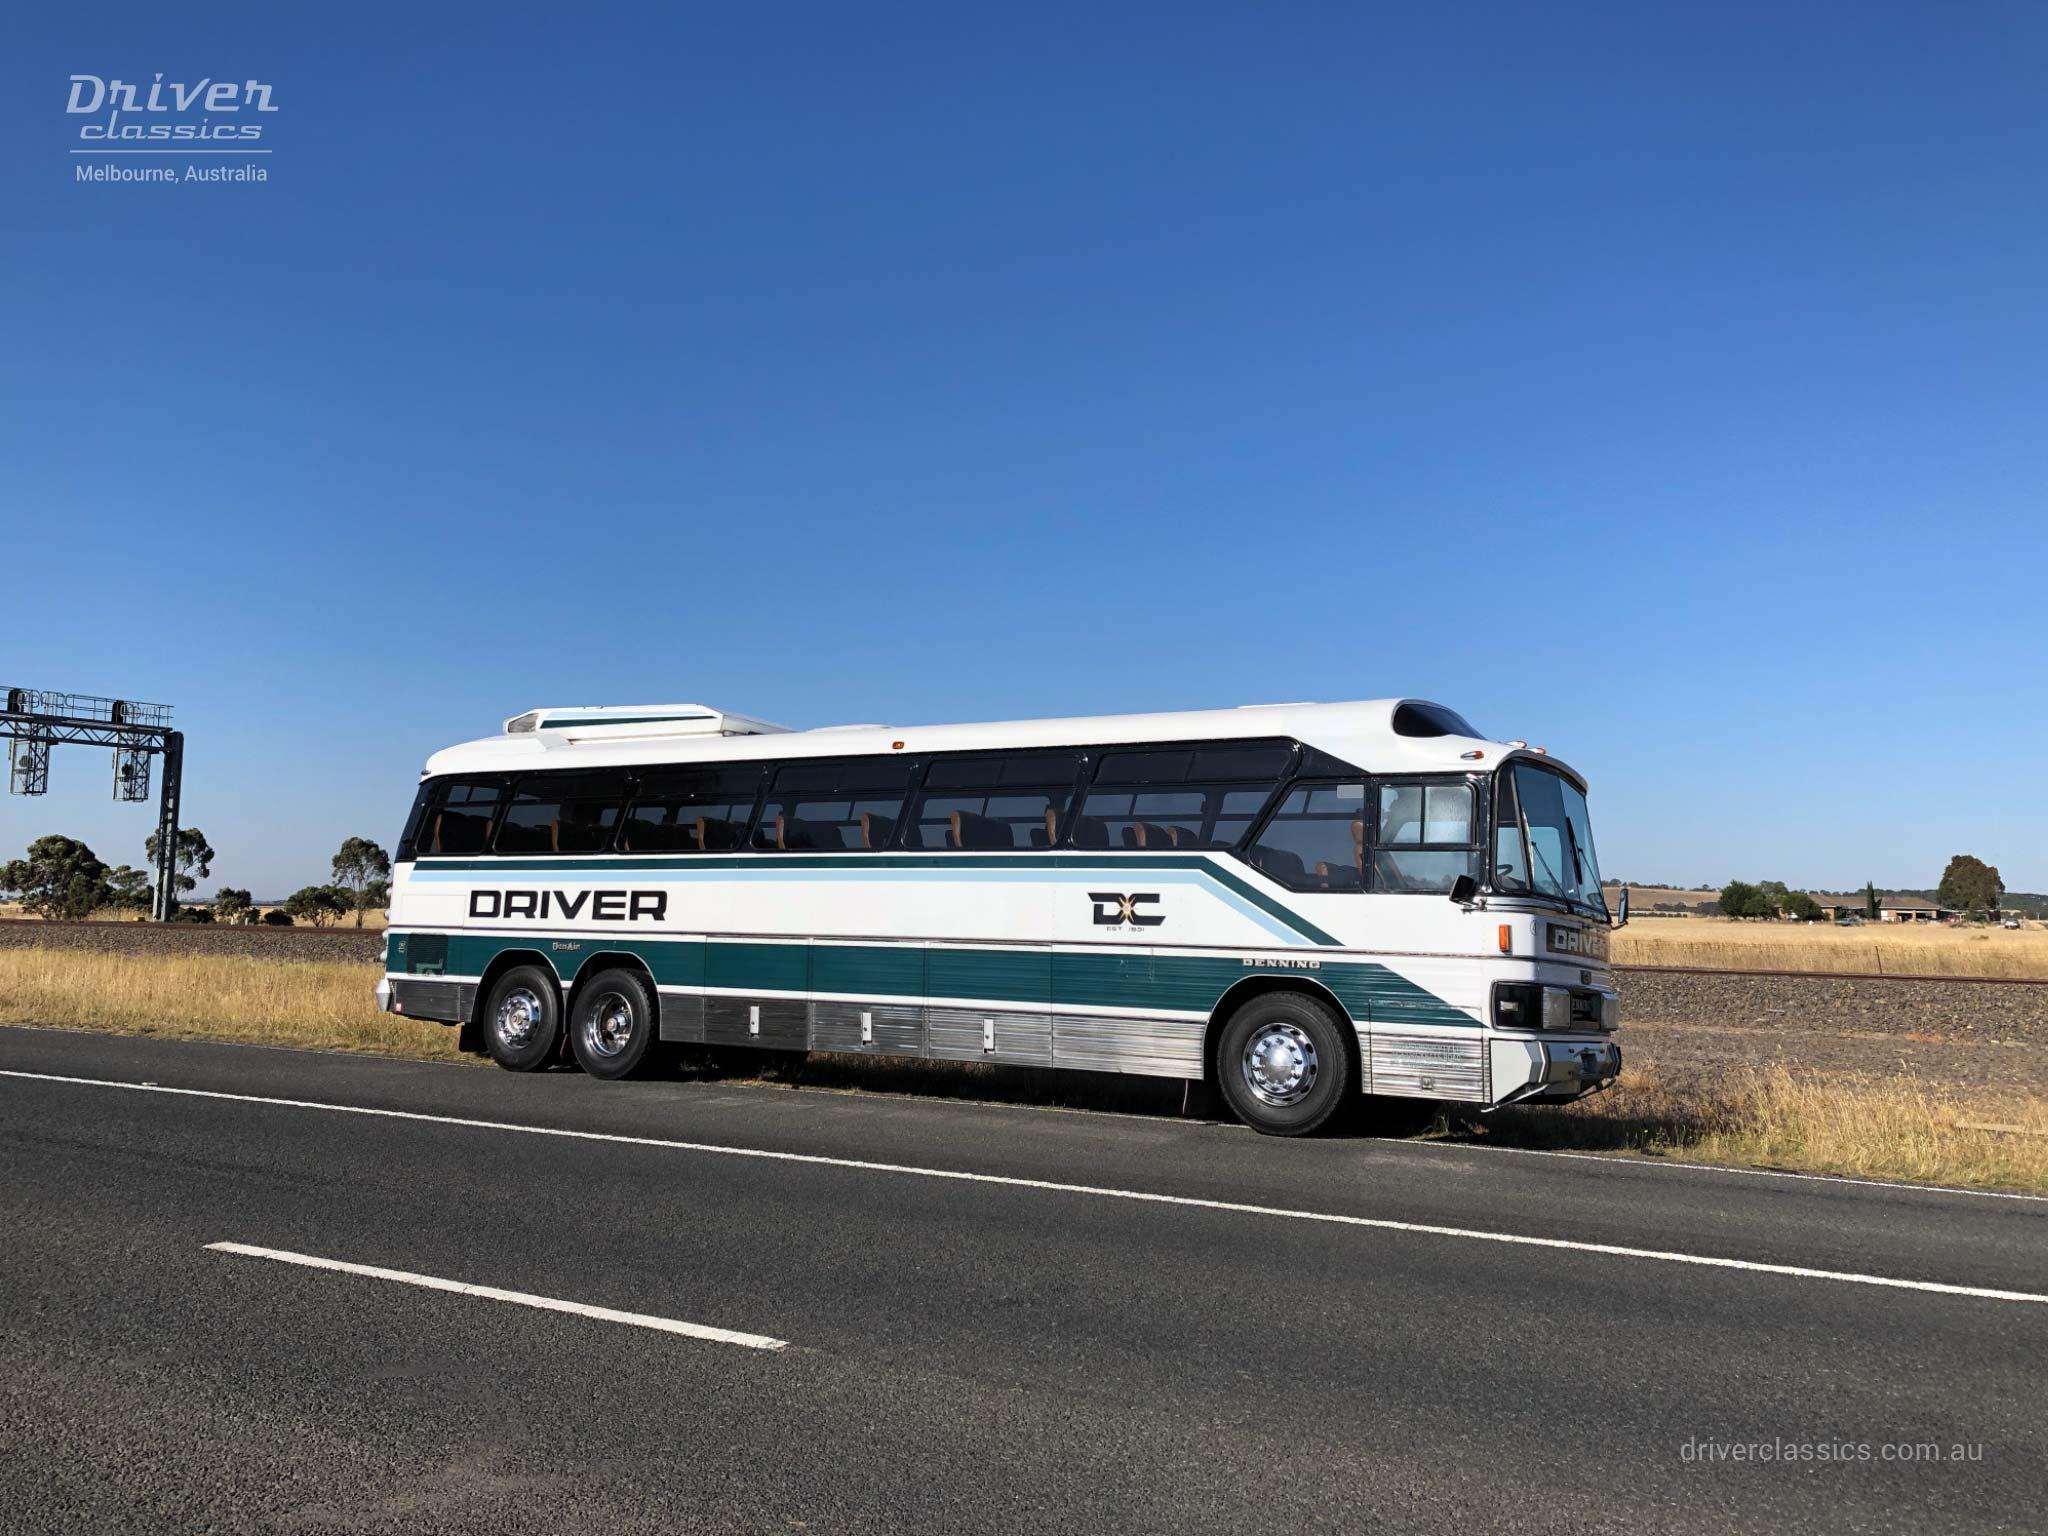 GM Denning DenAir Mono Bus, 1983 version, beside train line near Romsey VIC. Photo taken February 2019.